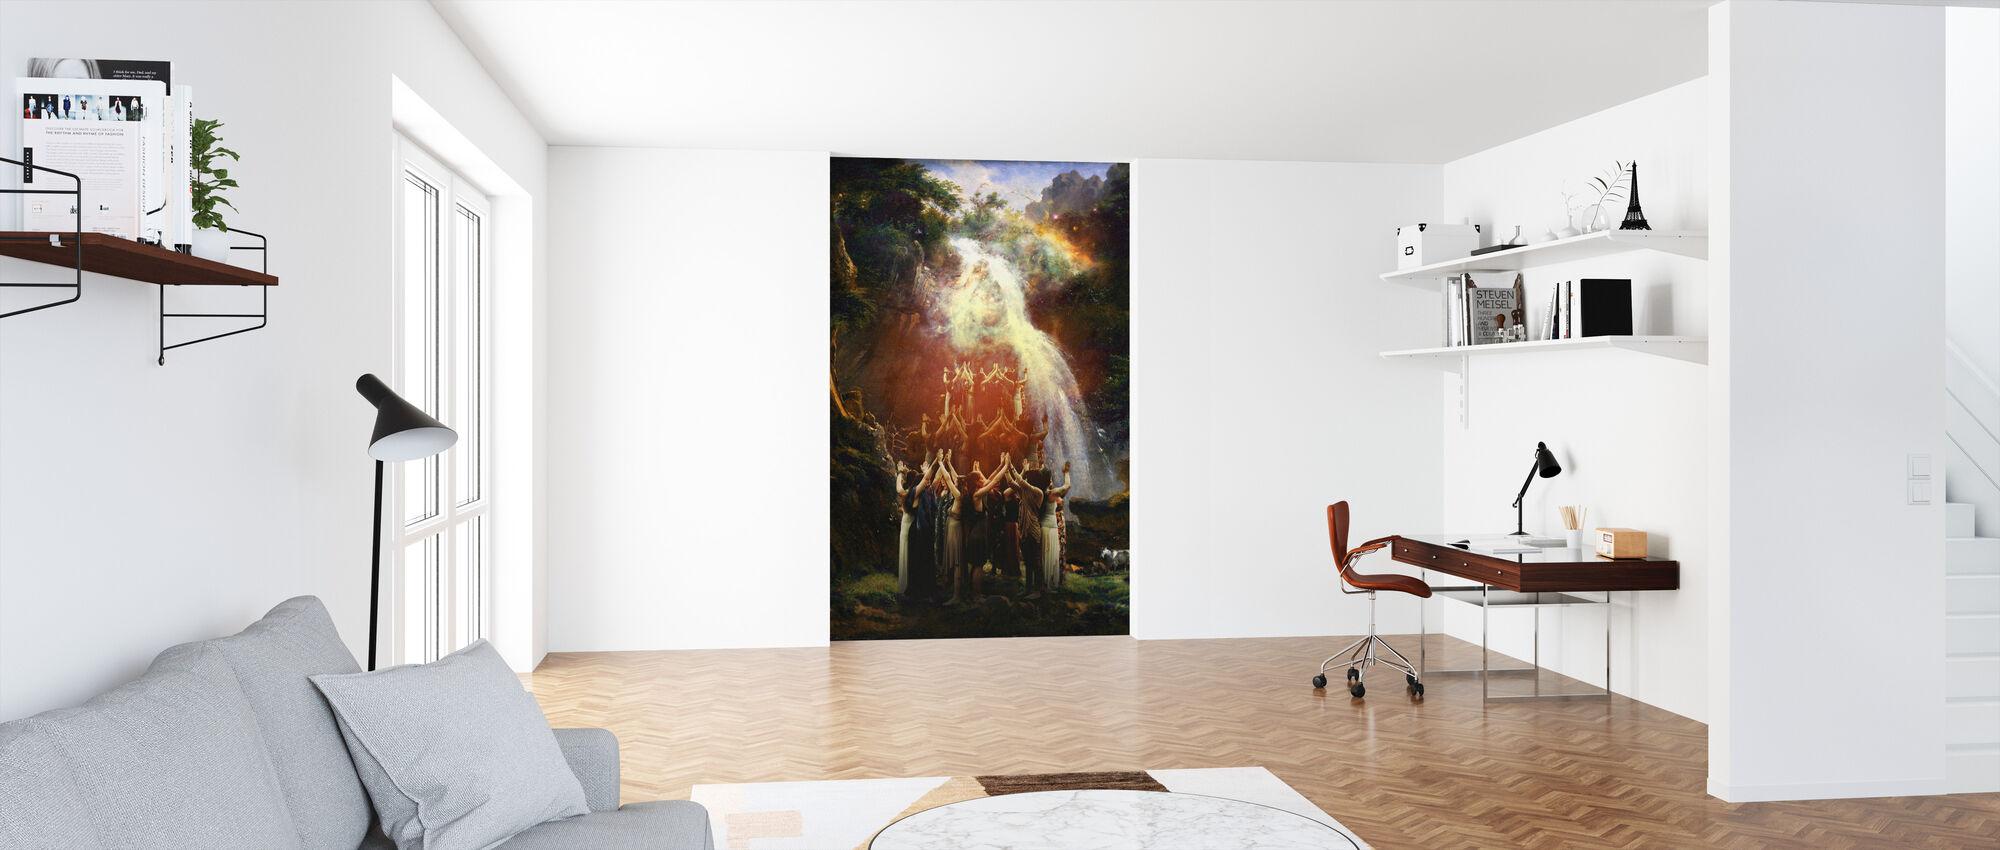 New World Order - Wallpaper - Office